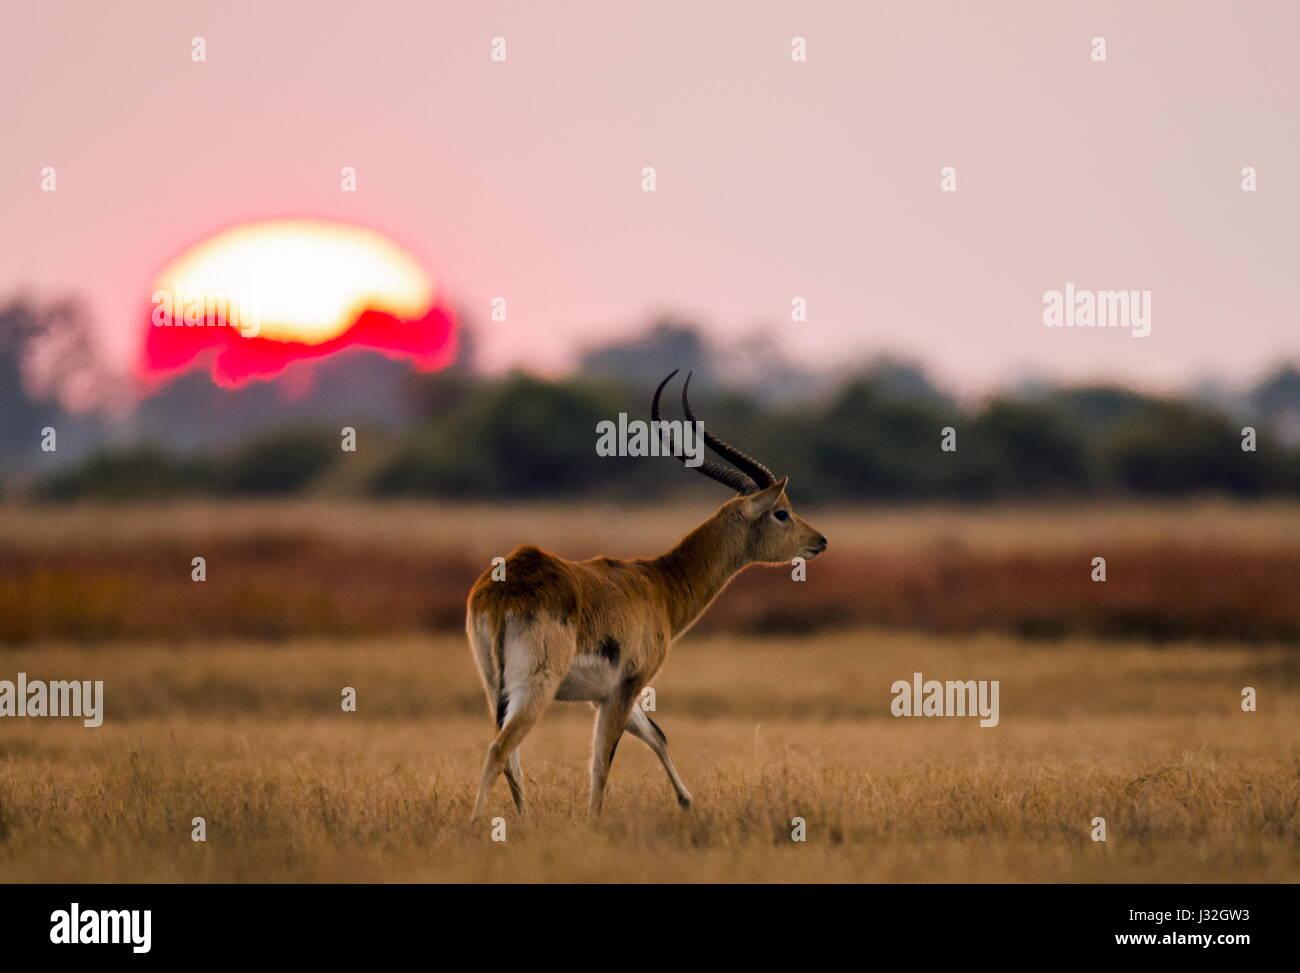 Antelope standing against the background of a large of sunrise sun. Botswana. Okavango Delta. An excellent illustration. - Stock Image